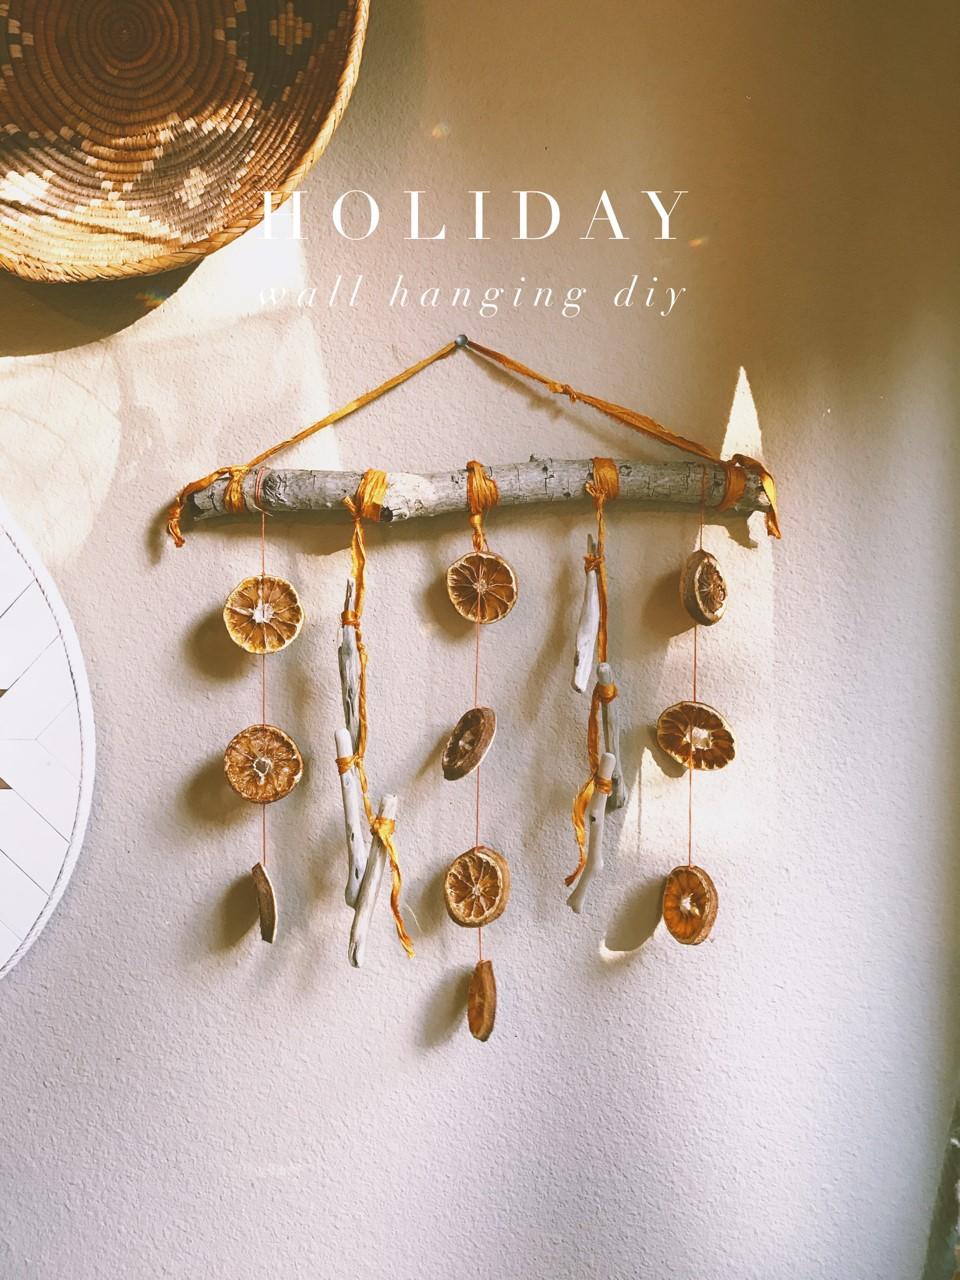 Holiday Wall Hanging DIY via bohocollective.com